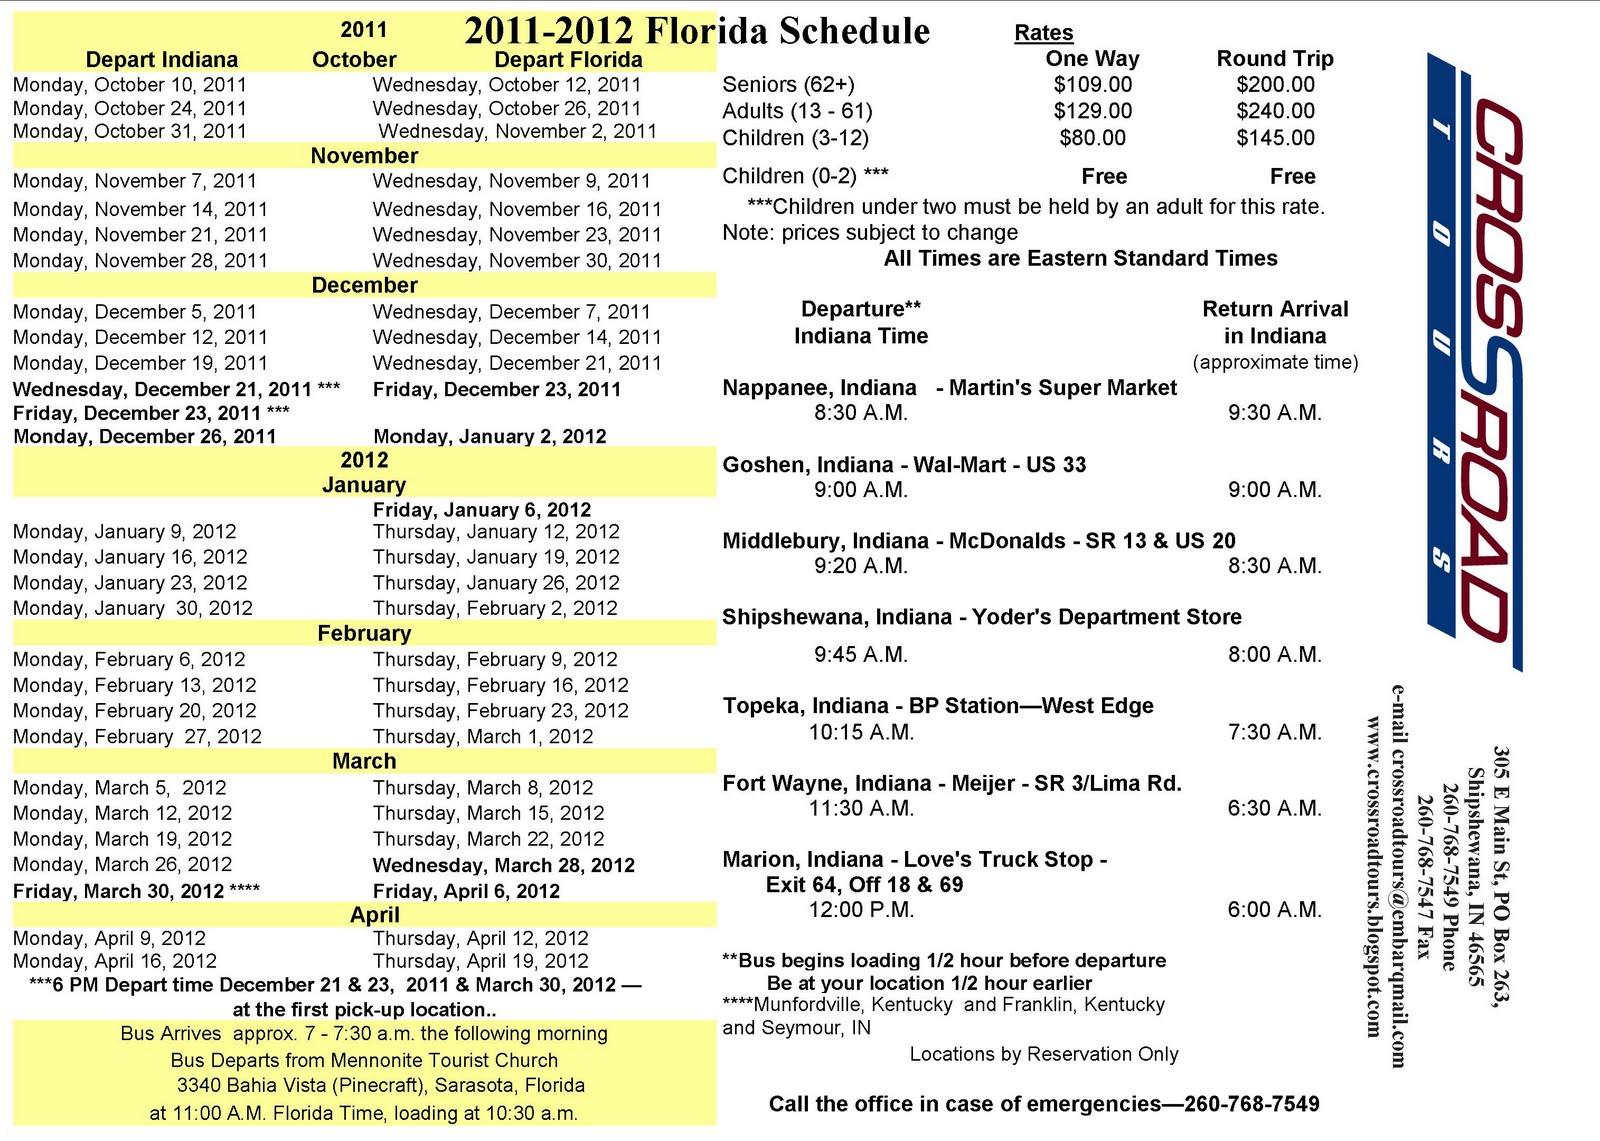 Florida Schedule 2011-2012